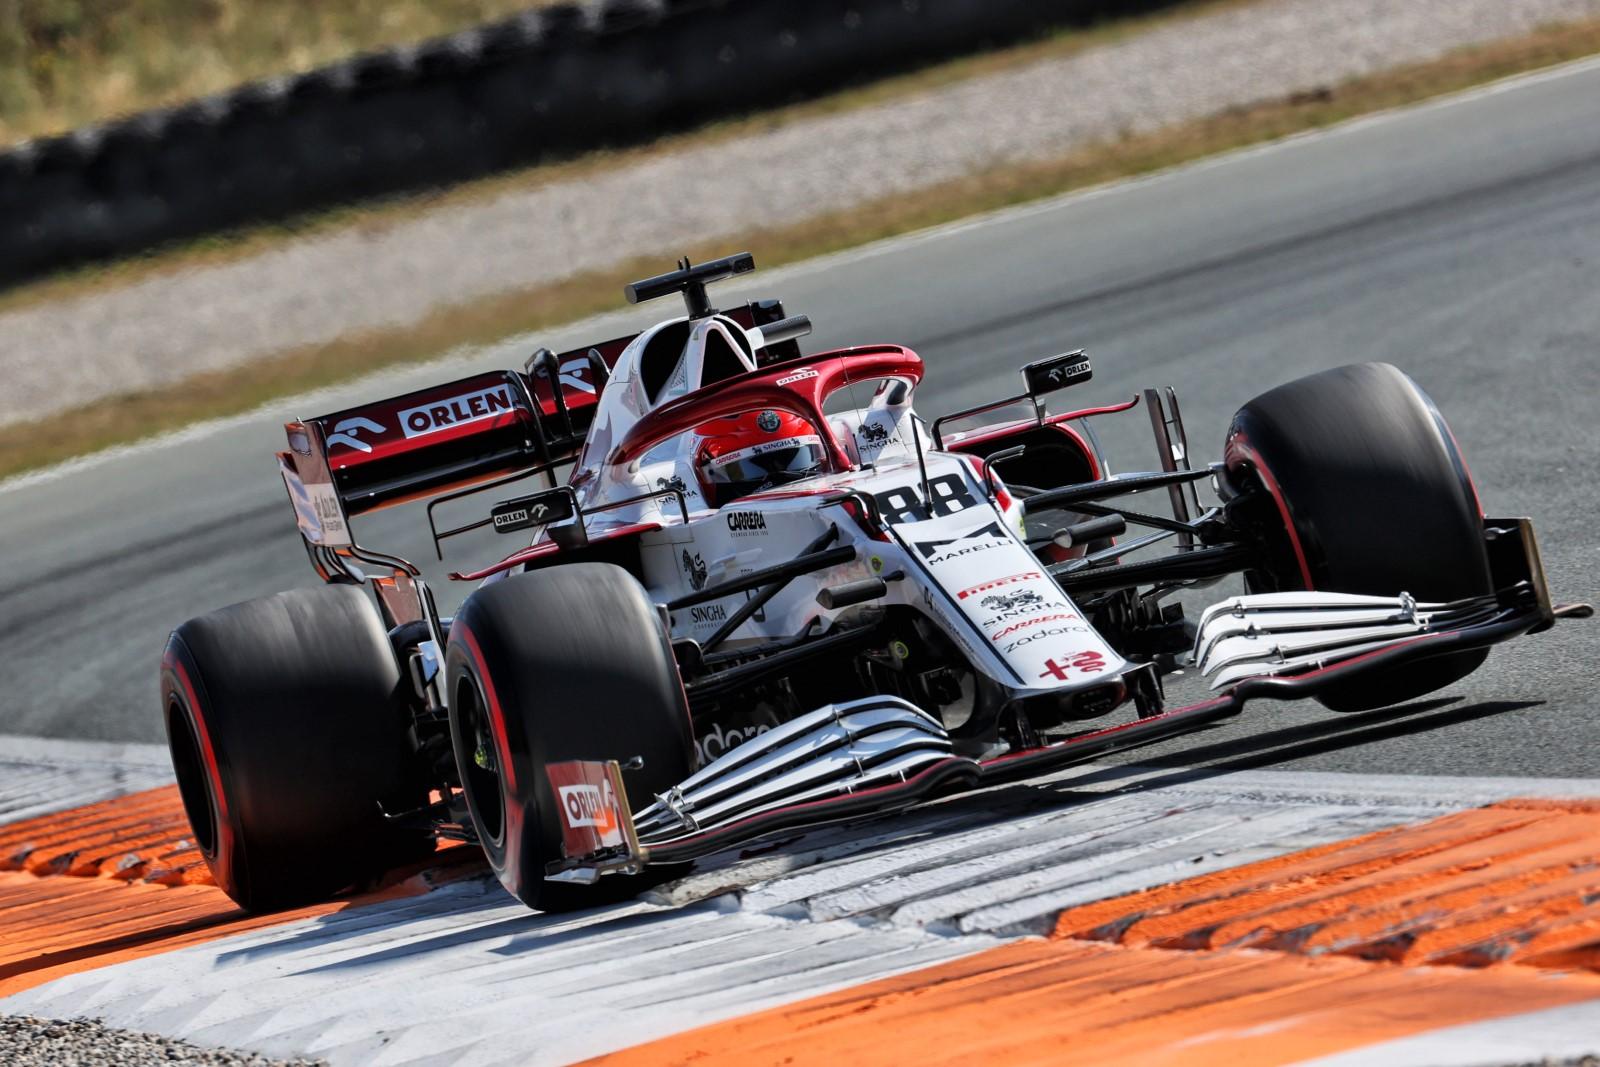 Kubica 'took safe approach' after 21-month absence – Motorsport Week